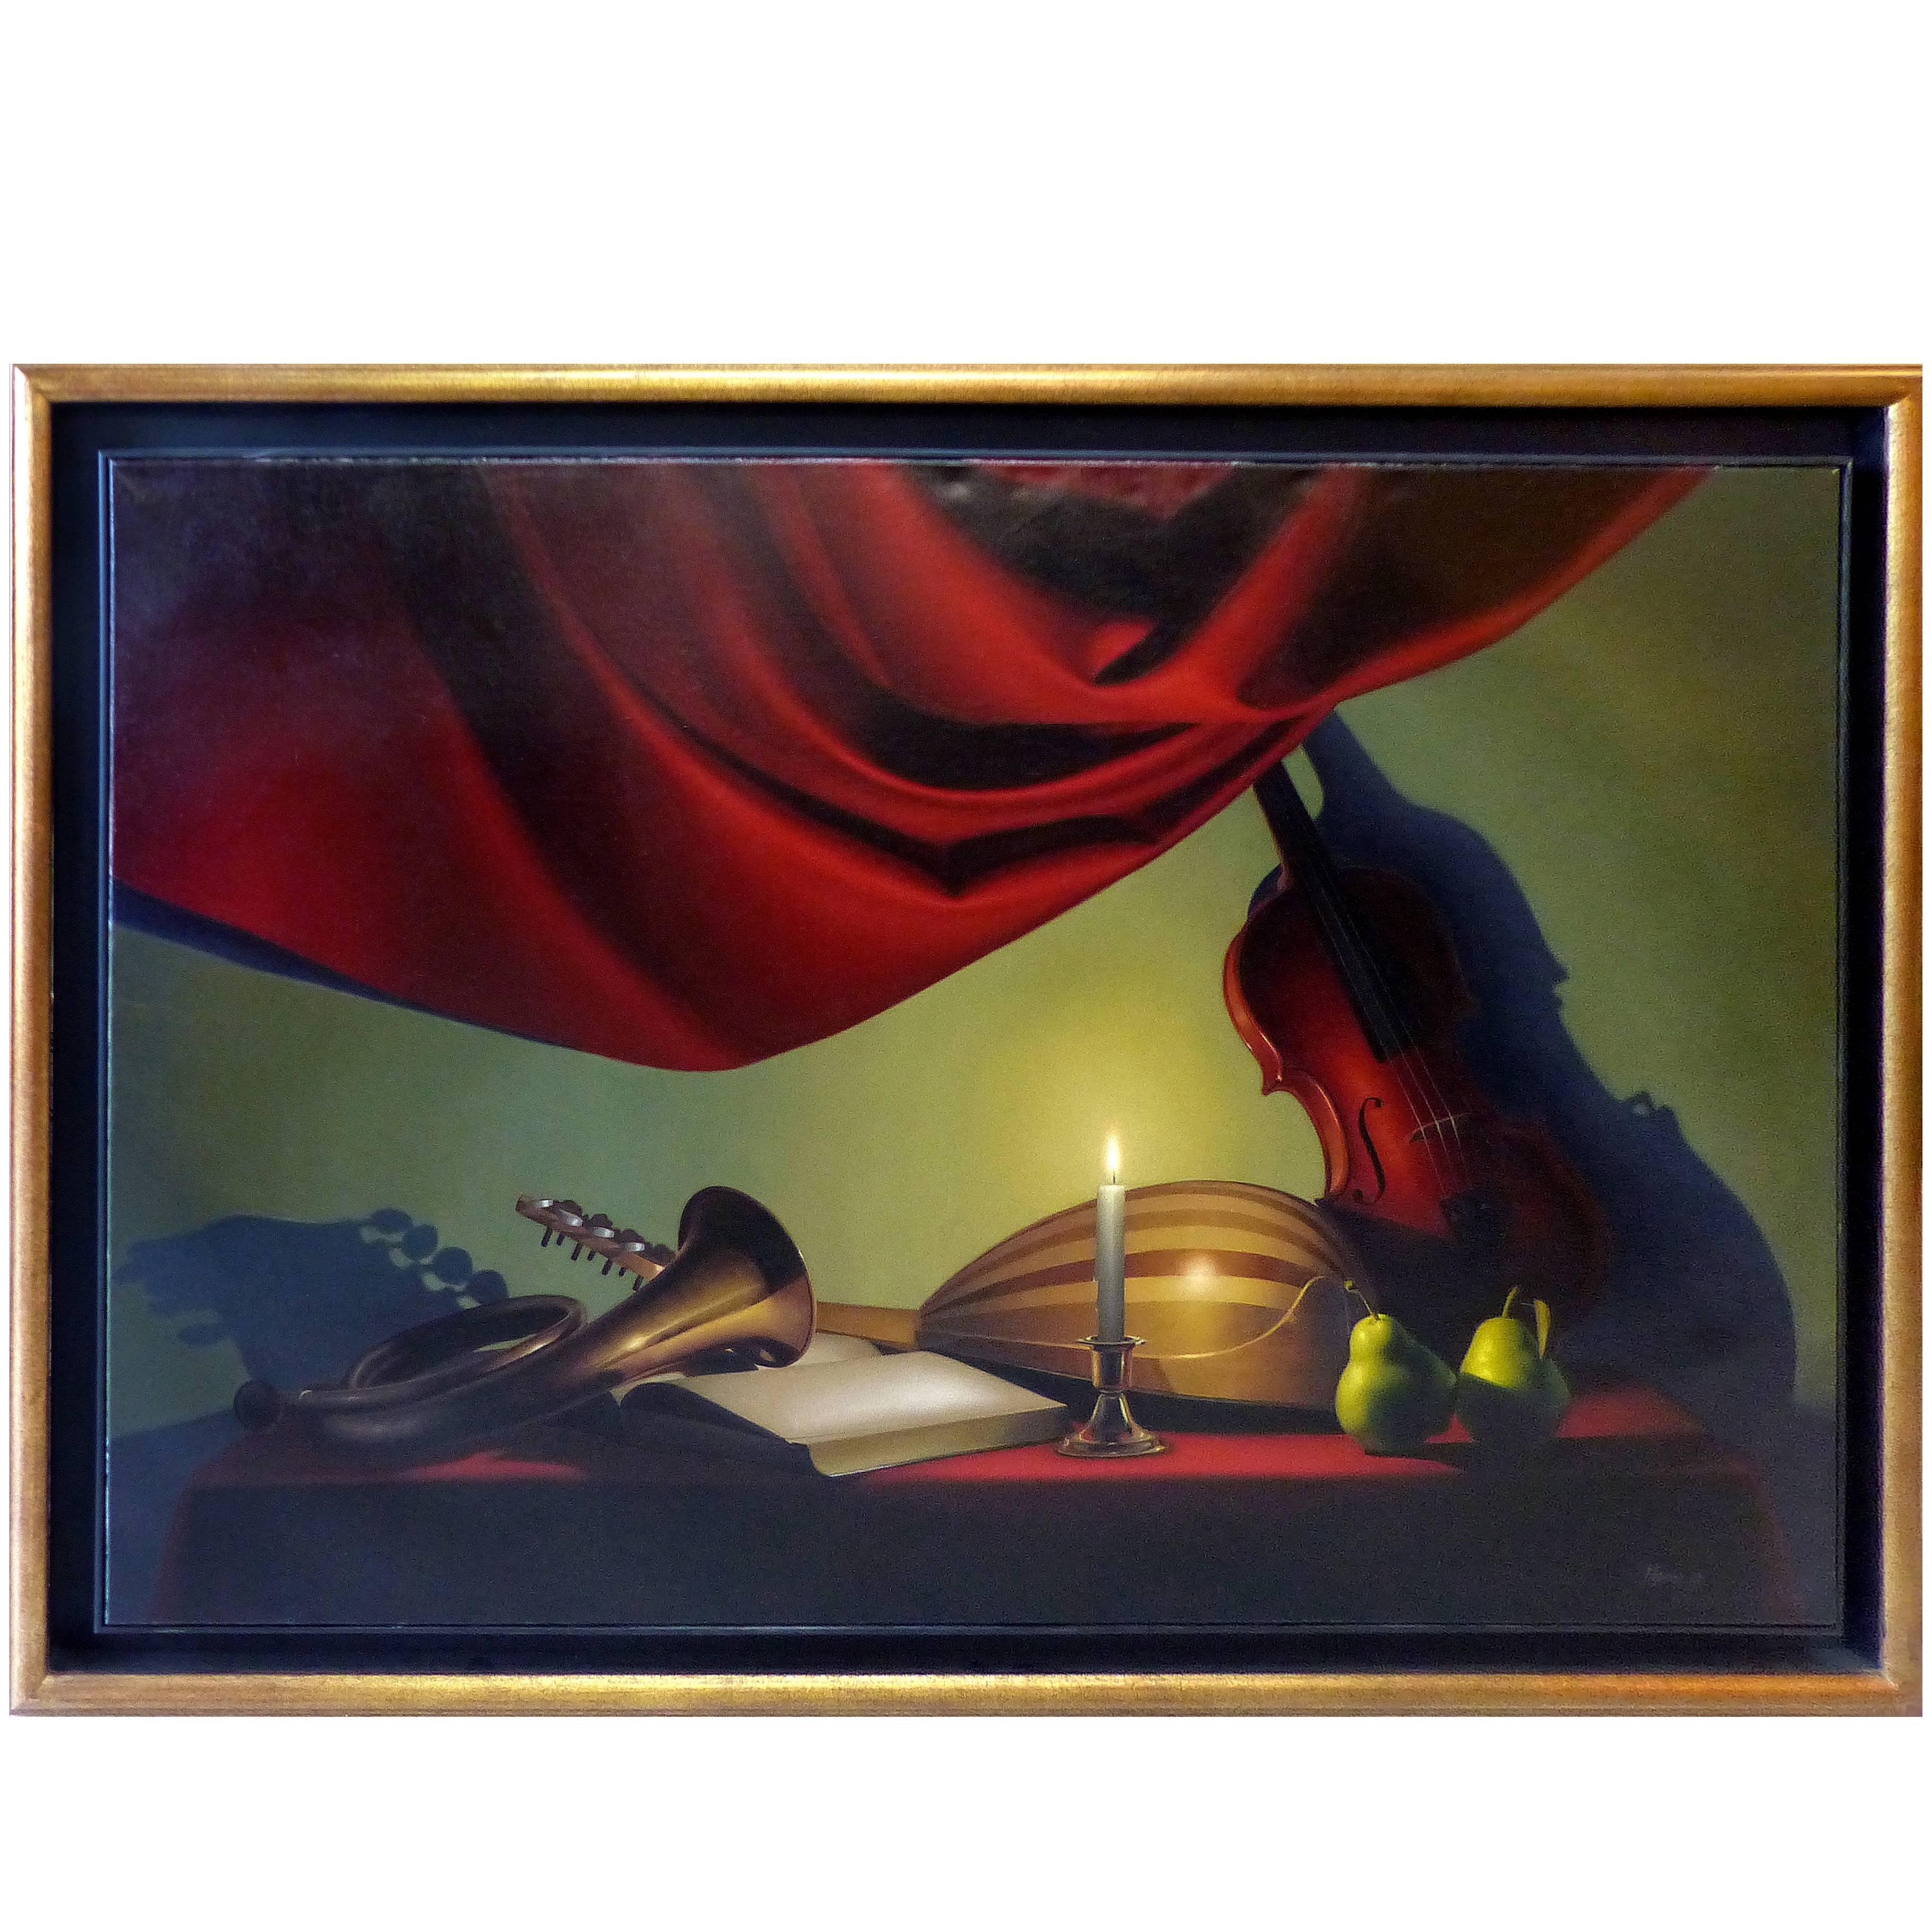 Nicolas Fasolino Realism Oil Painting on Canvas, Argentine Artist